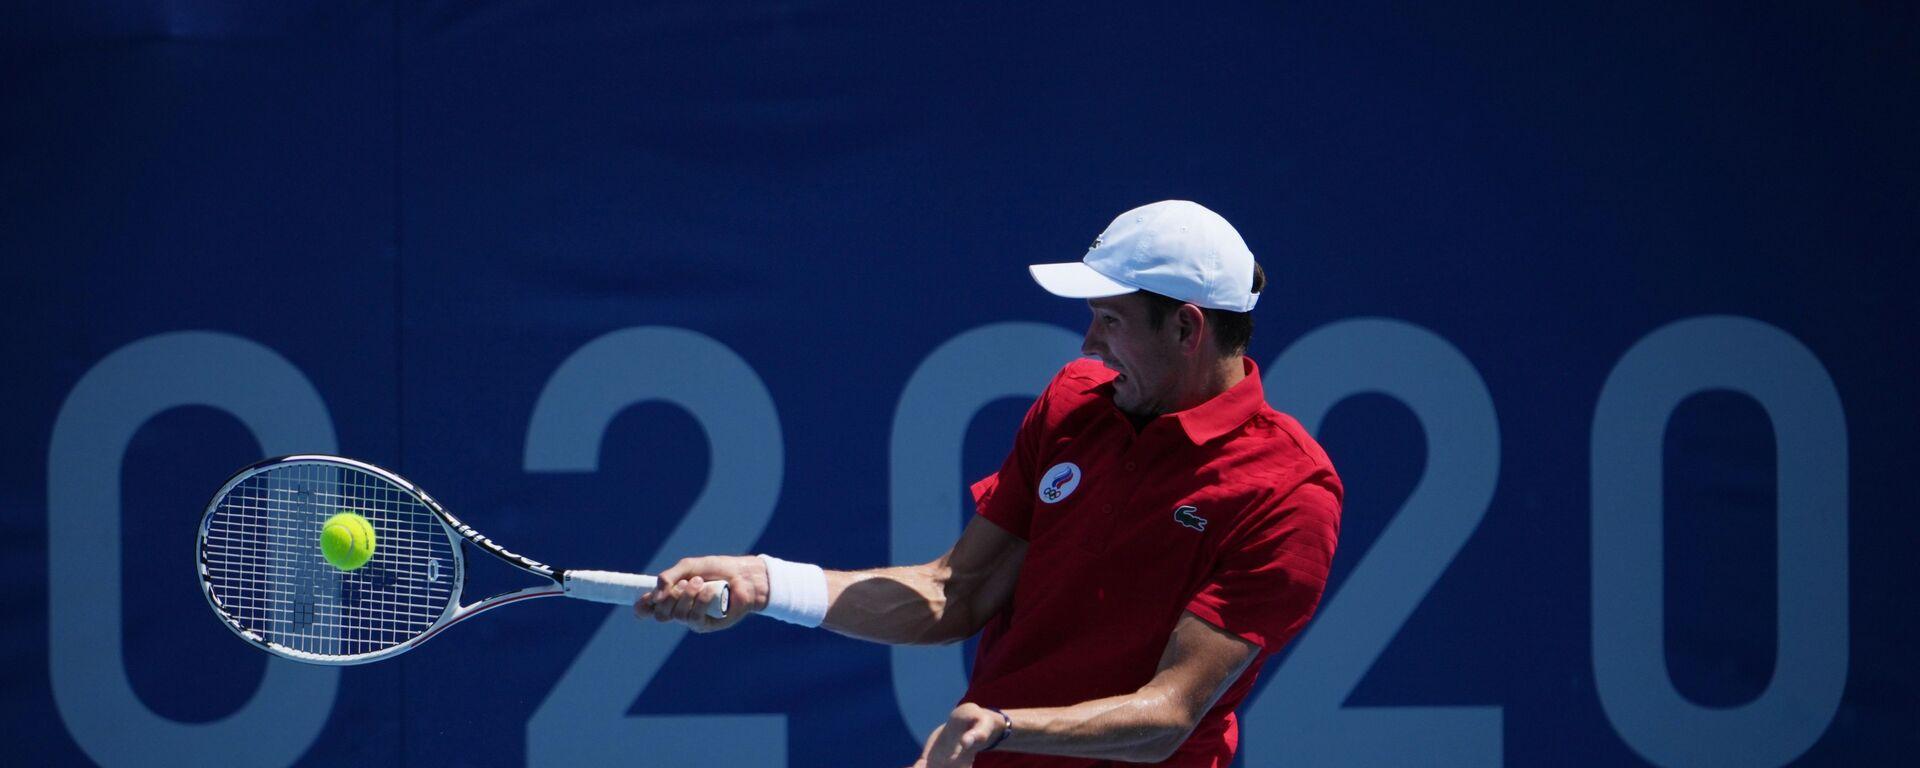 Ruský tenista Daniil Medveděv na olympijských hrách v Tokiu  - Sputnik Česká republika, 1920, 24.07.2021